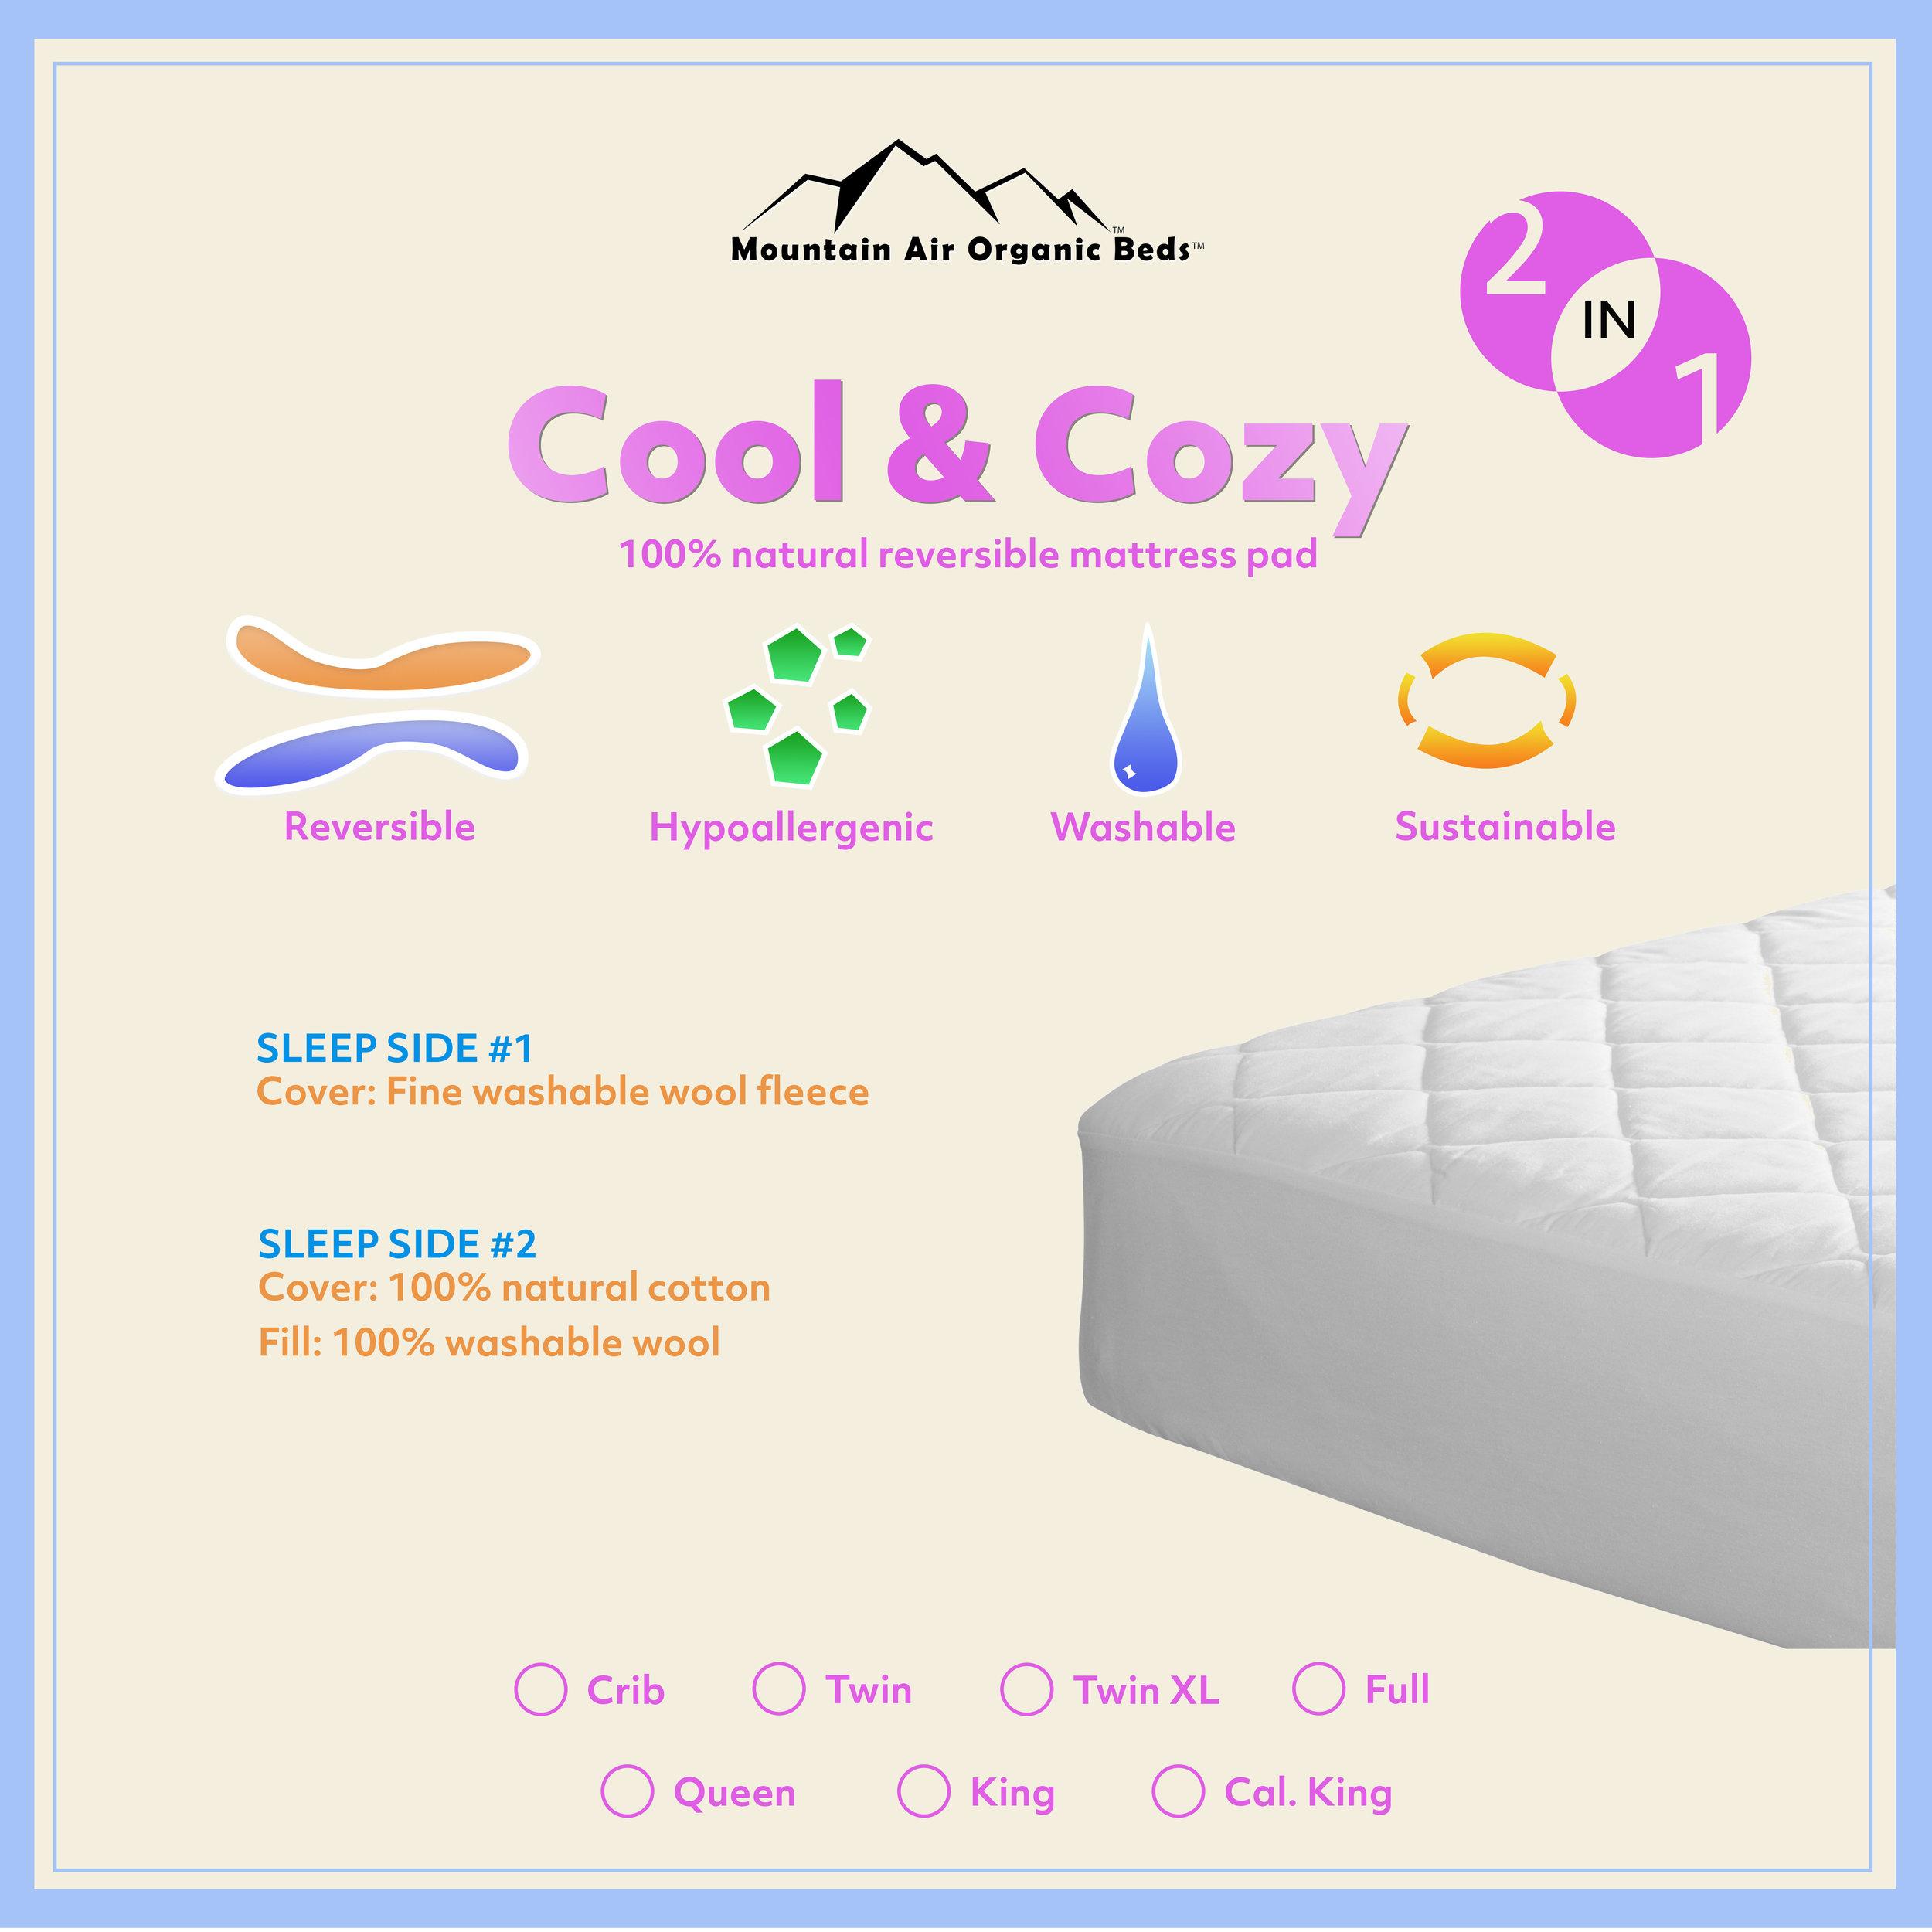 Cool-&-Cozy.jpg